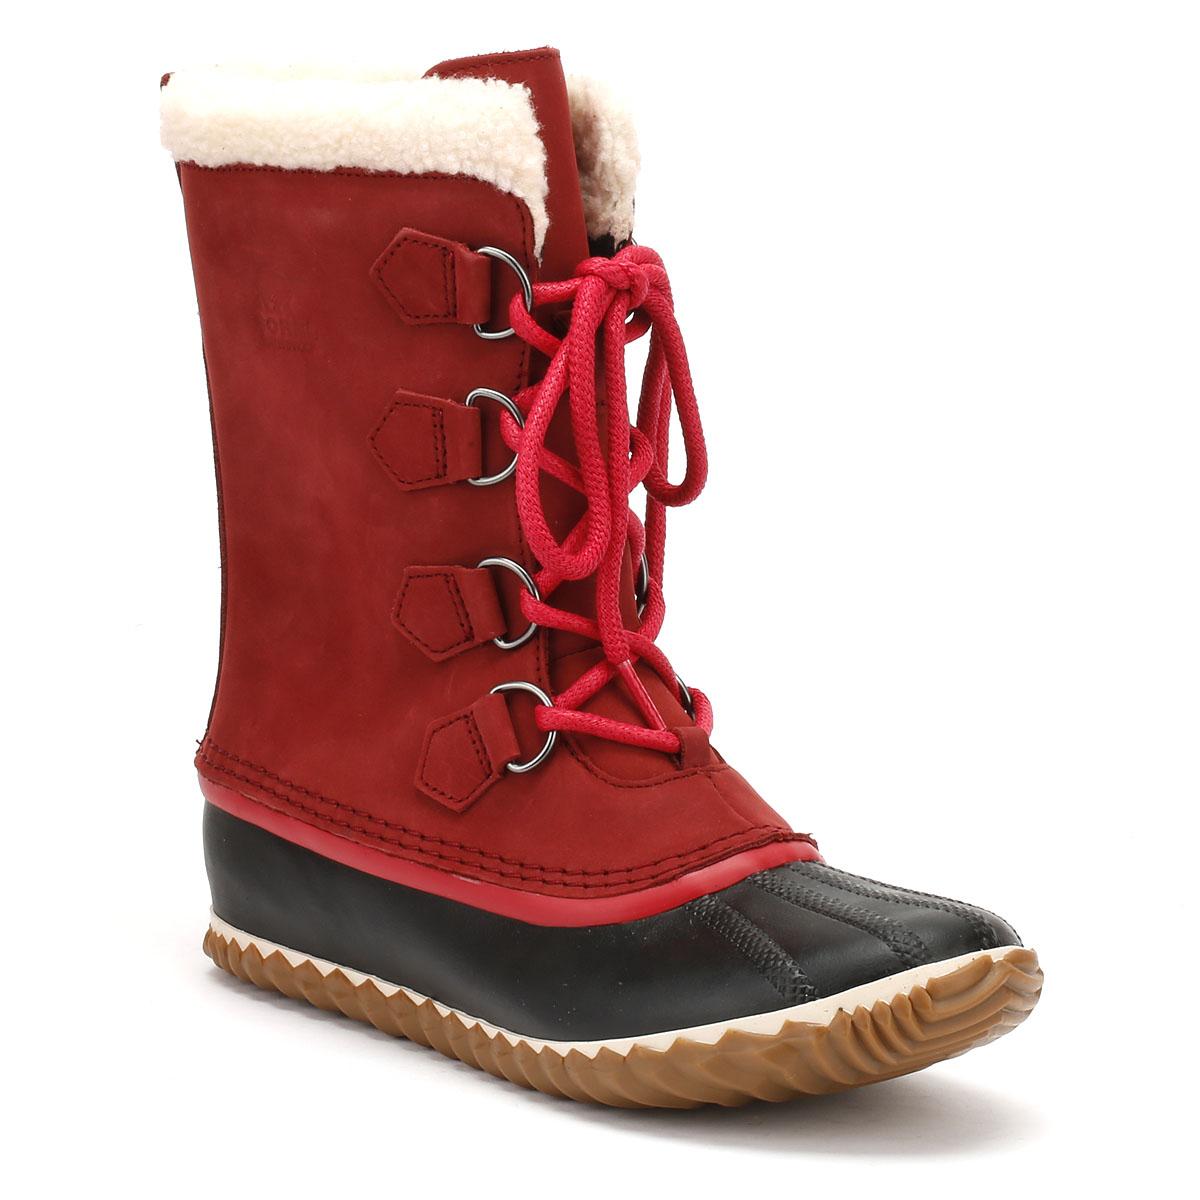 Sorel Womens Red & Black Caribou Slim Boots Warm Winter ...